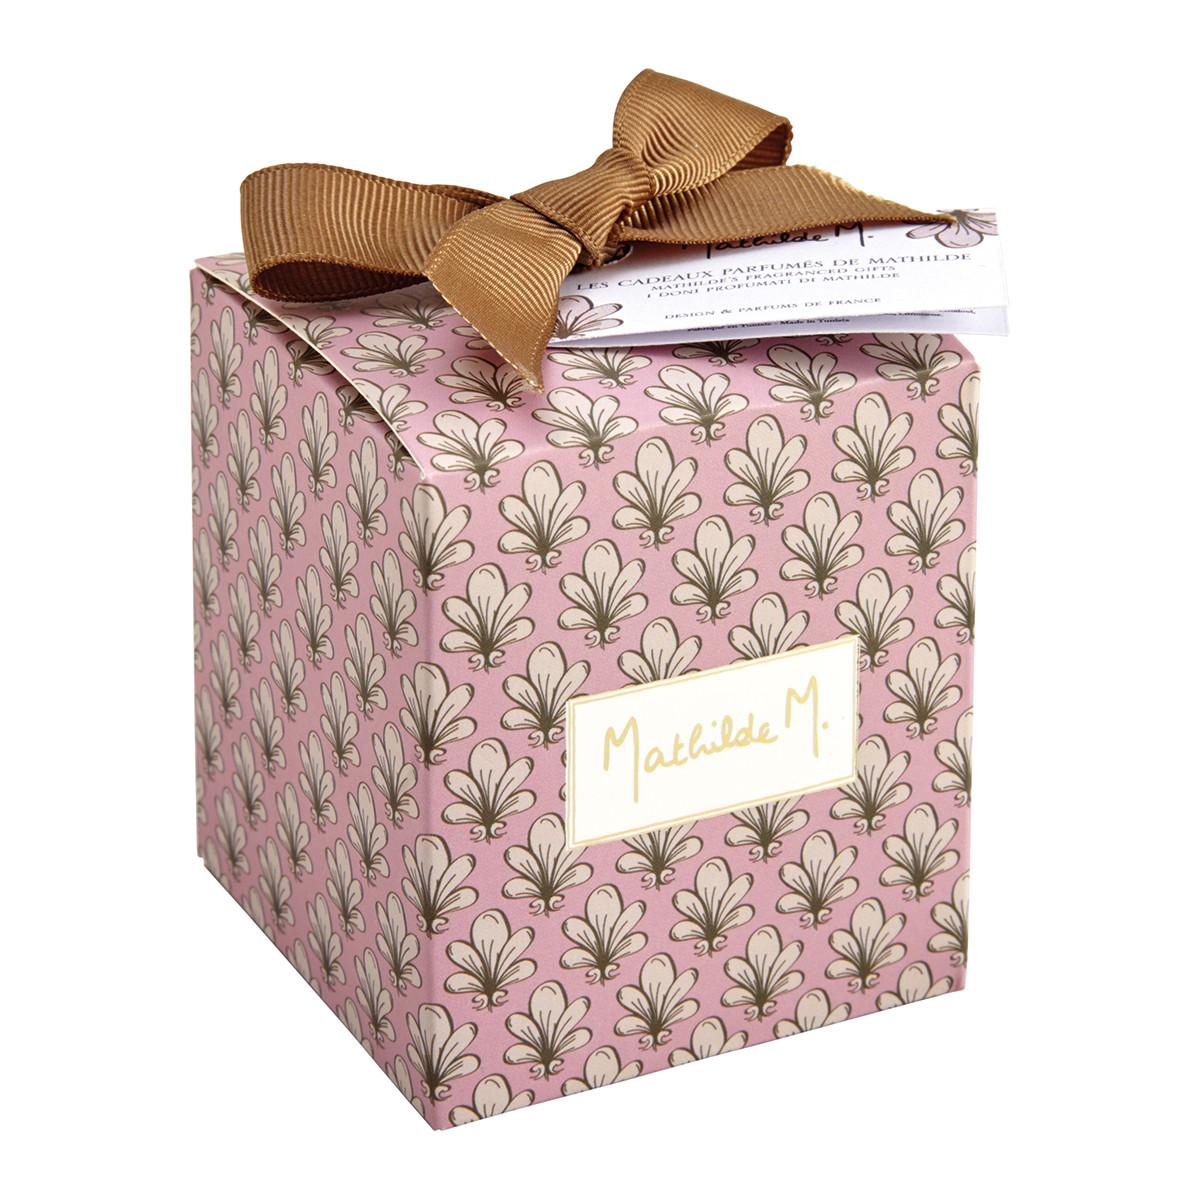 Presente Perfumado Mathilde M. - Marquise & Rose Élixir